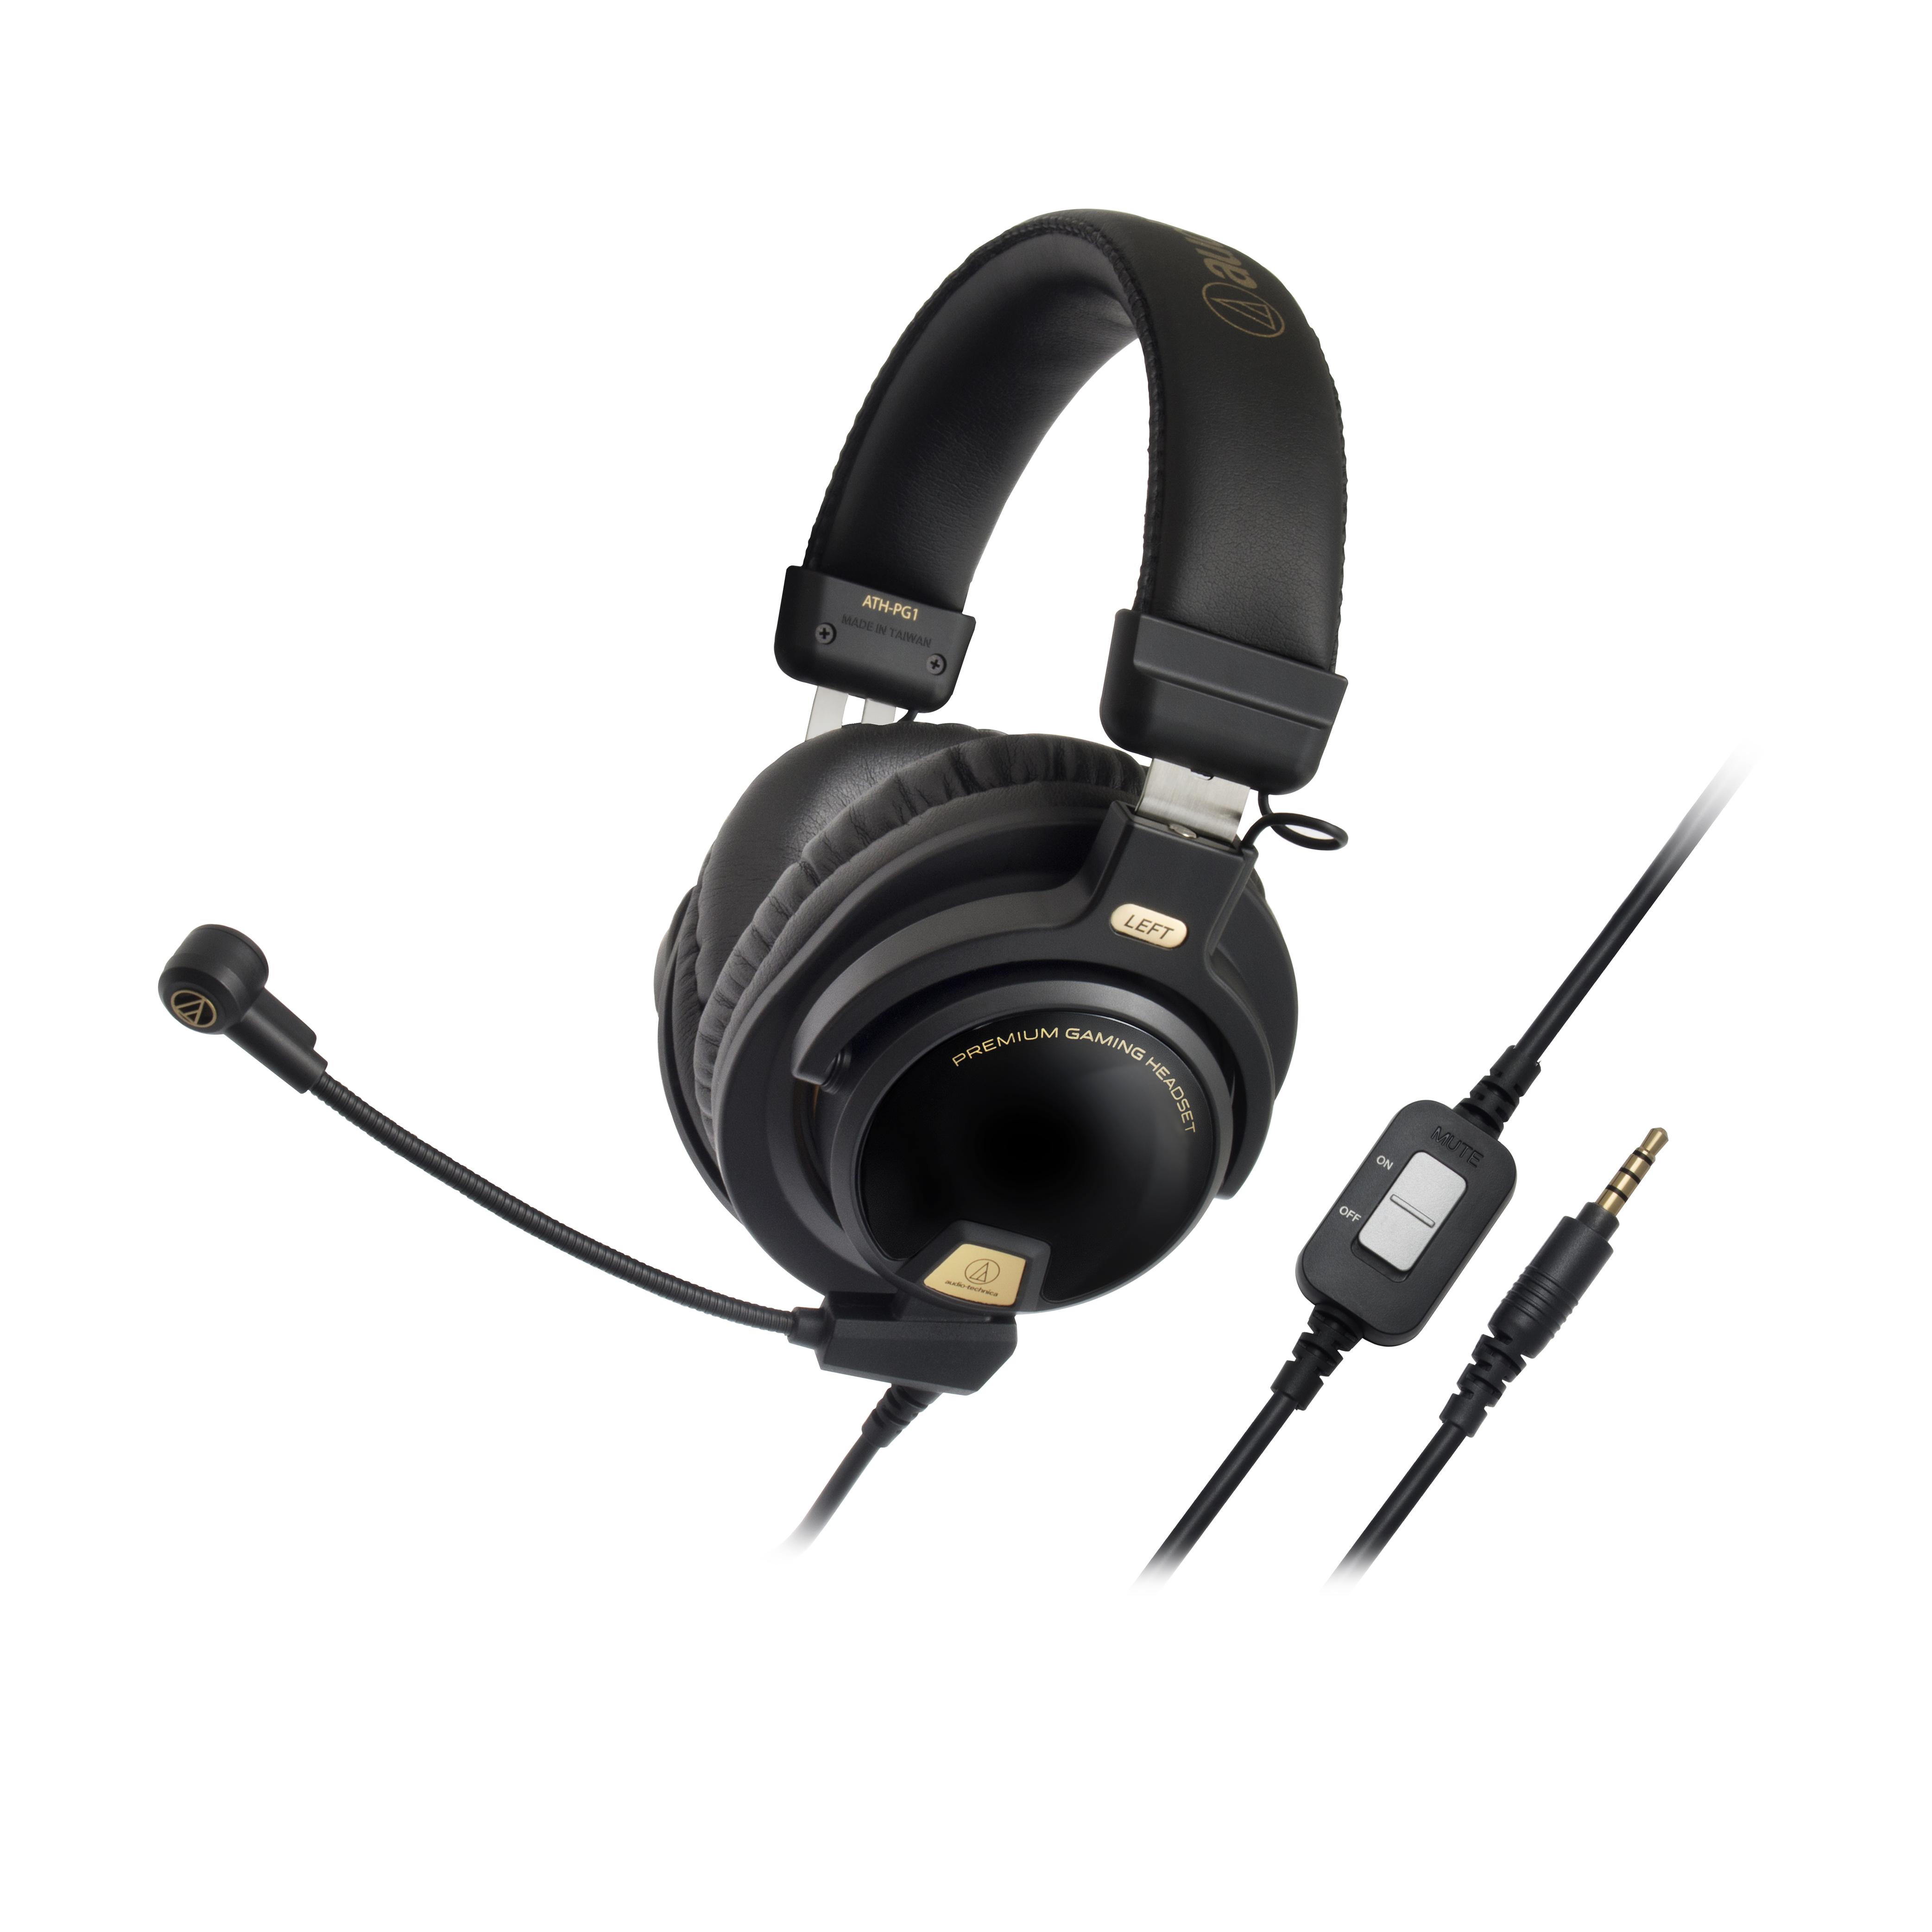 Audio Technica ATGM1 USB Mikrofon (PC)